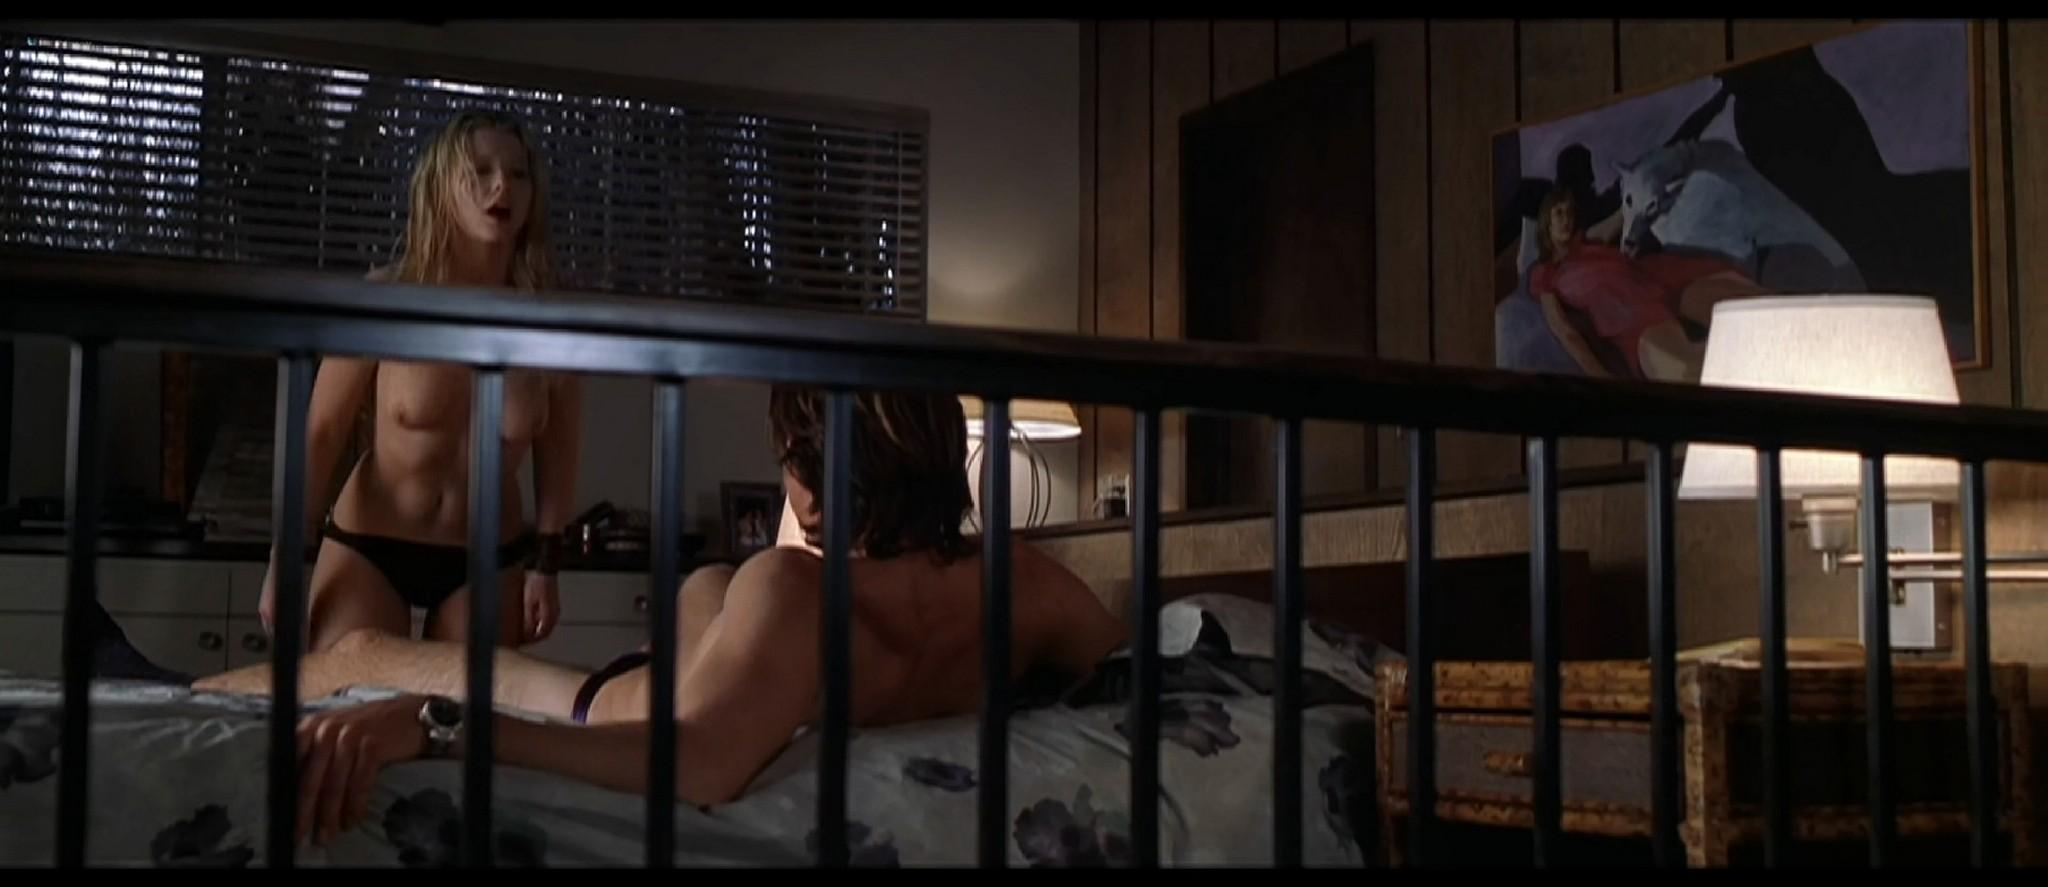 Tara Reid nude hot sex and Emily Procter nude body double - Body Shots (1999) HD 1080p Web (6)